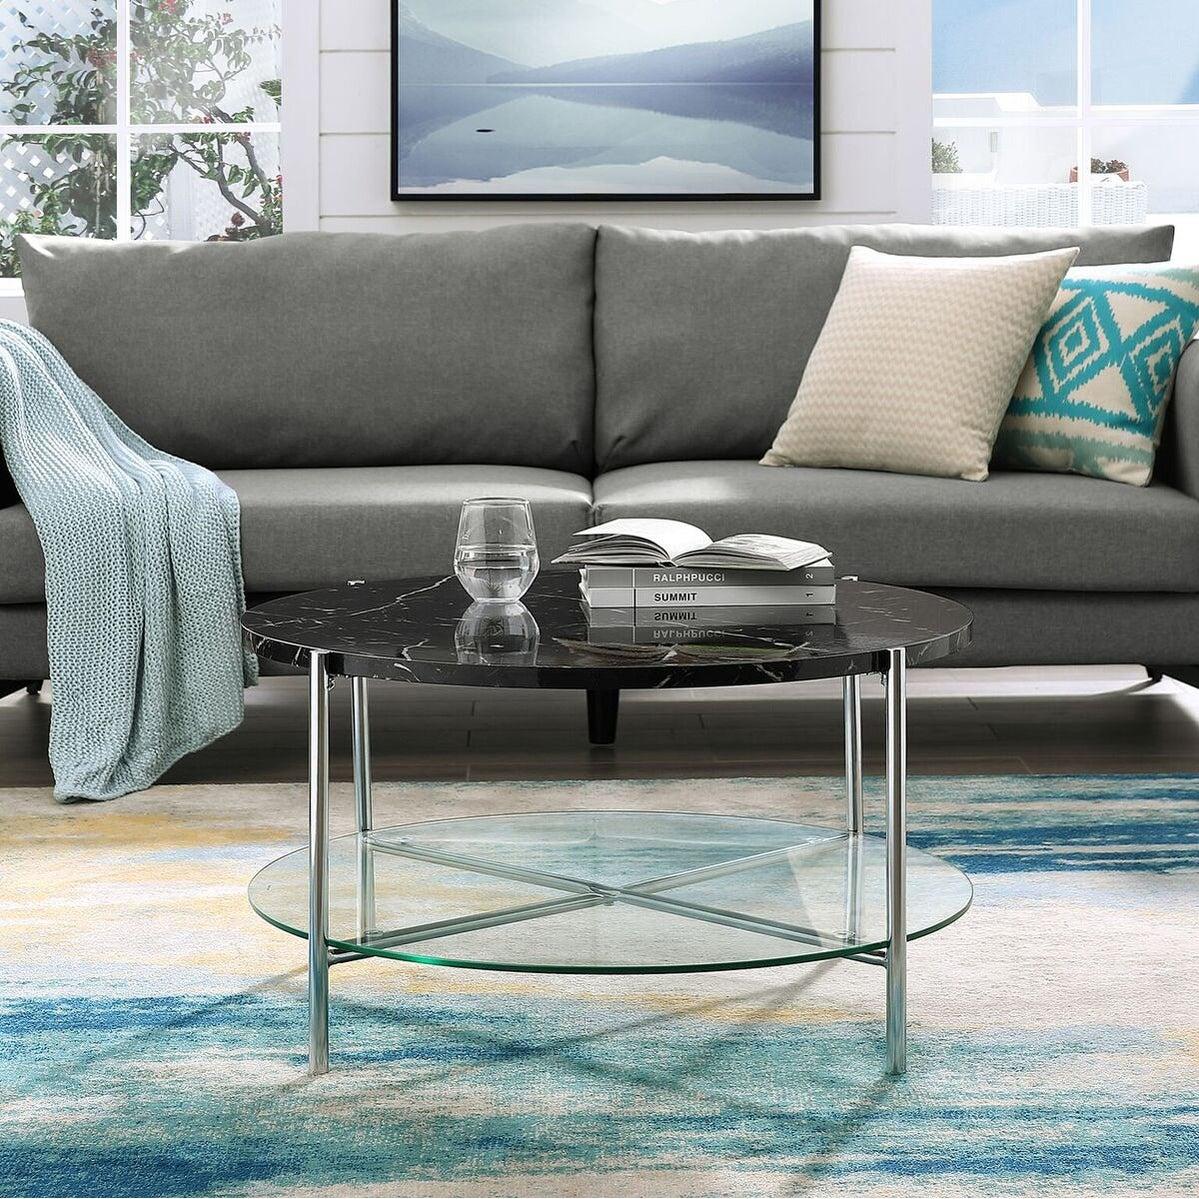 - Black Coffee Table Glass Top With Shelf Wood Legs Modern Living